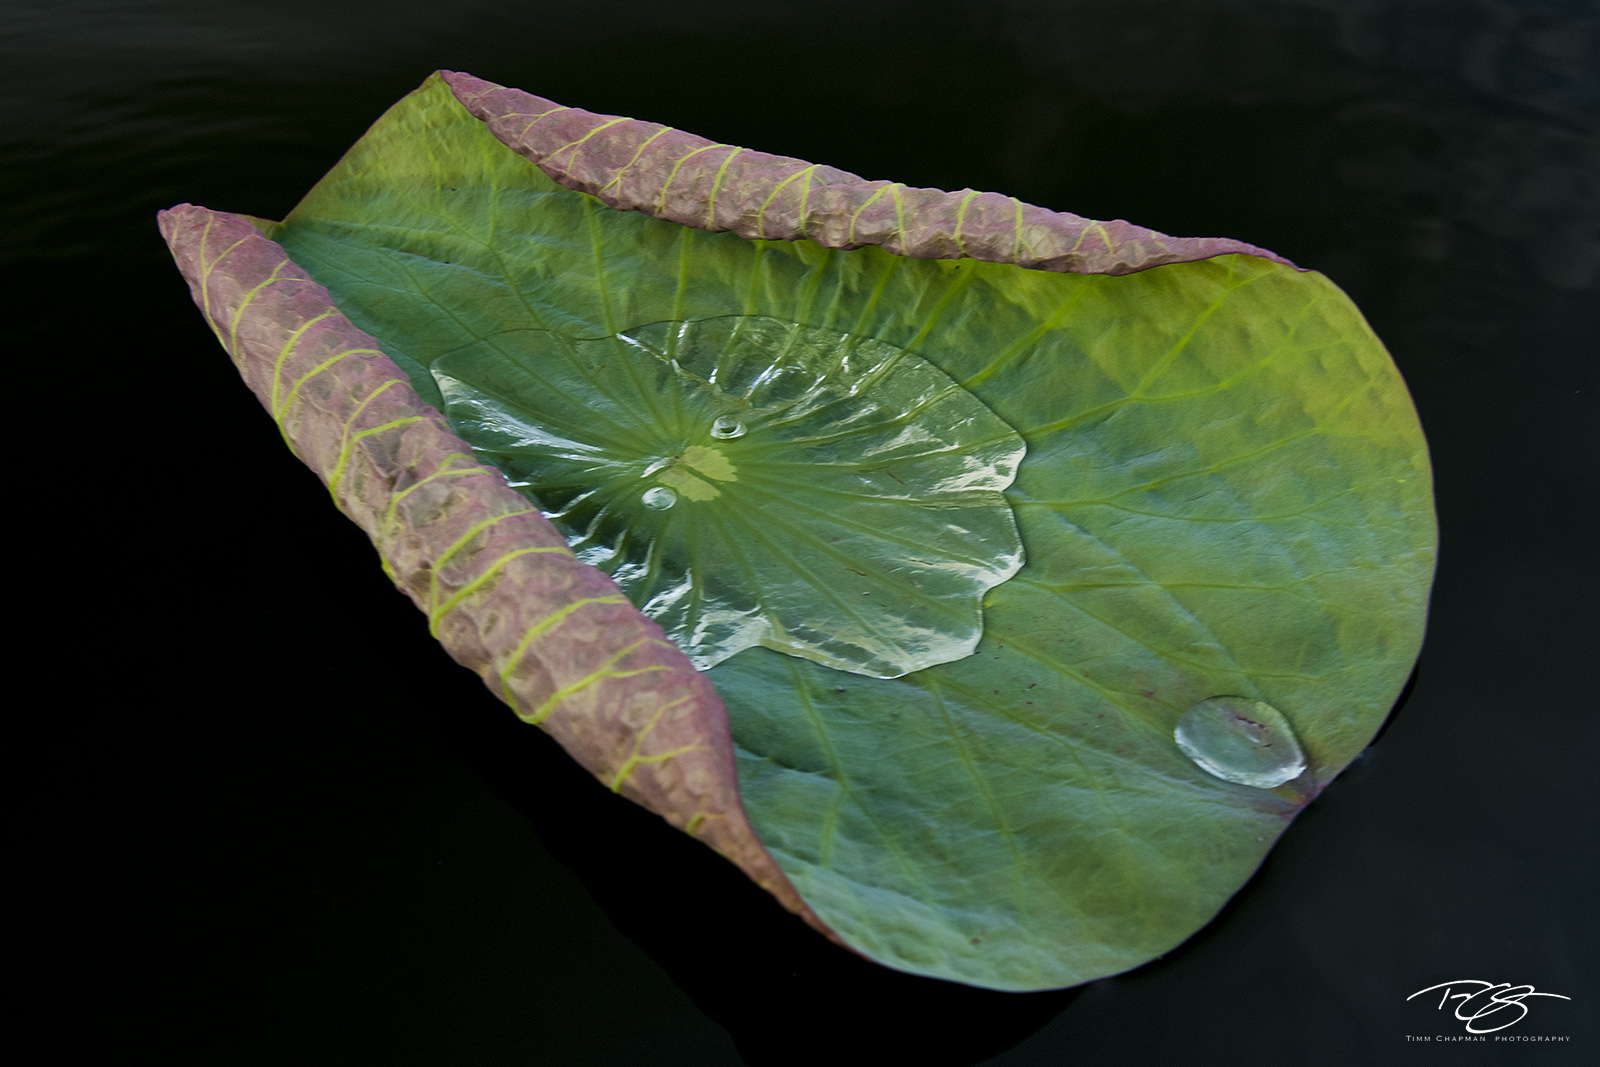 swamp, bayou, louisiana, dawn, water lily, atchafalaya basin, leaf, water, green, water droplet, lily, photo